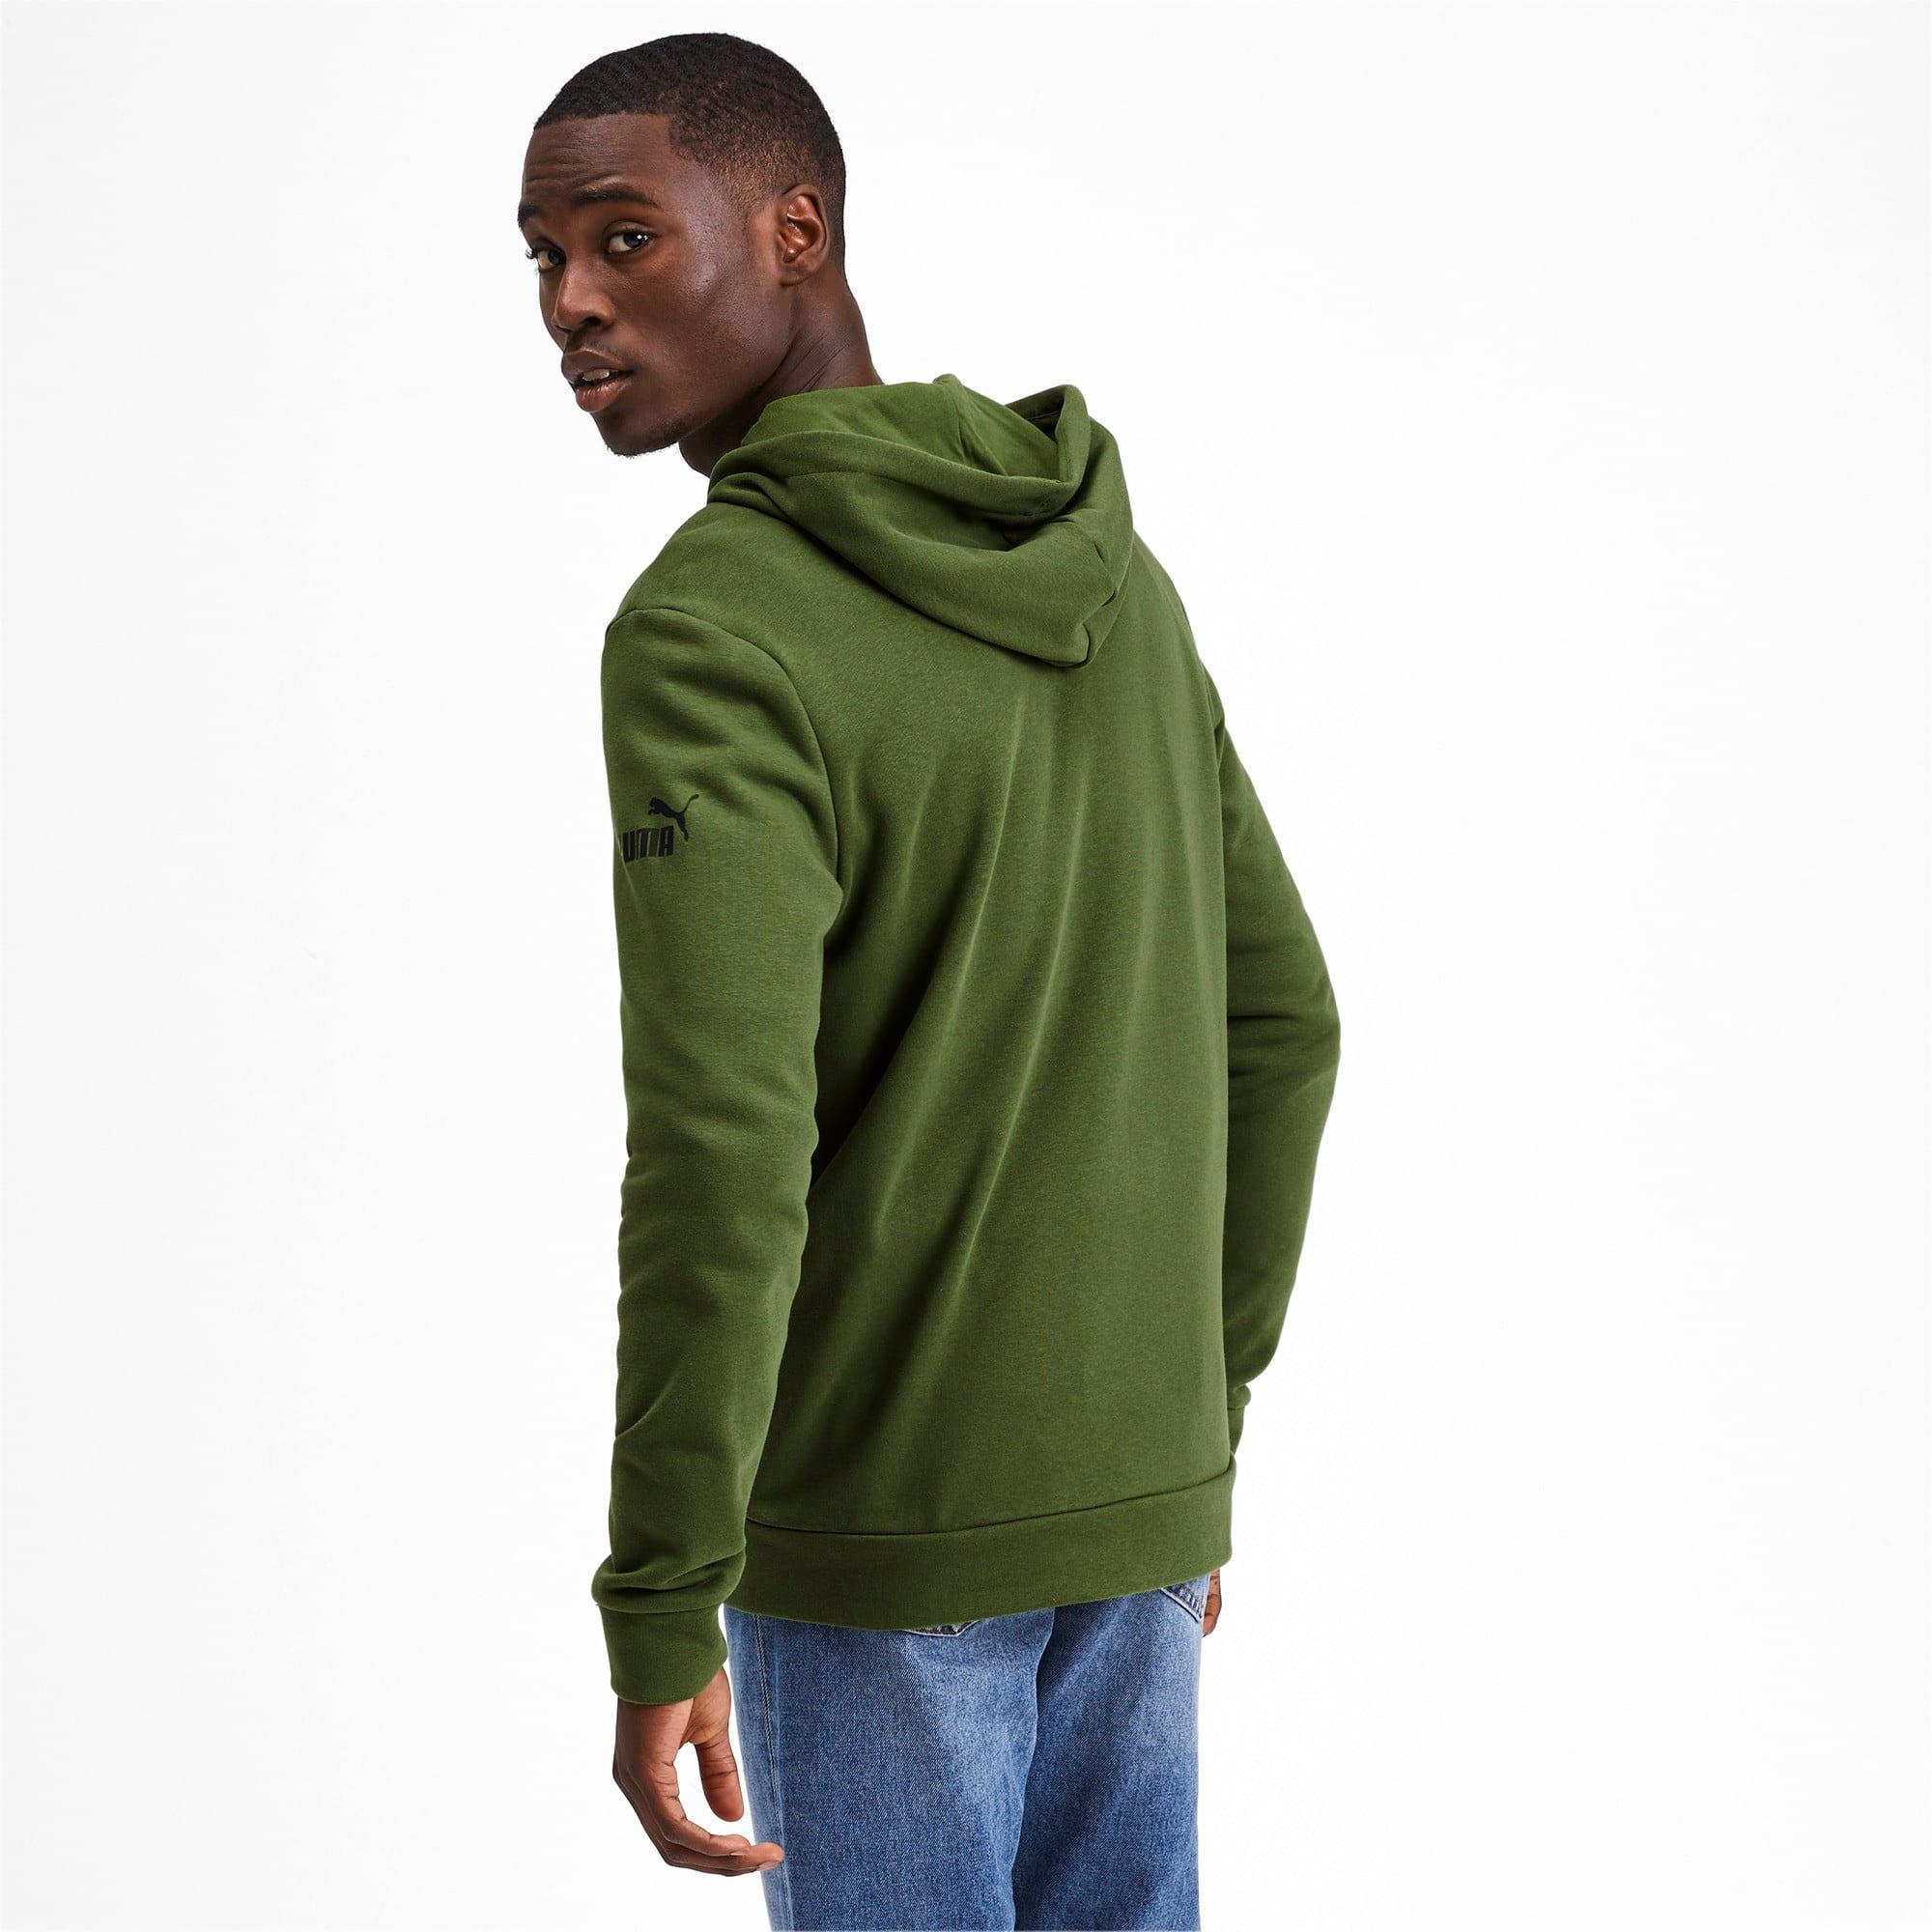 Miniatura 3 de Chaqueta con capucha Amplified para hombre, Garden Green, mediano